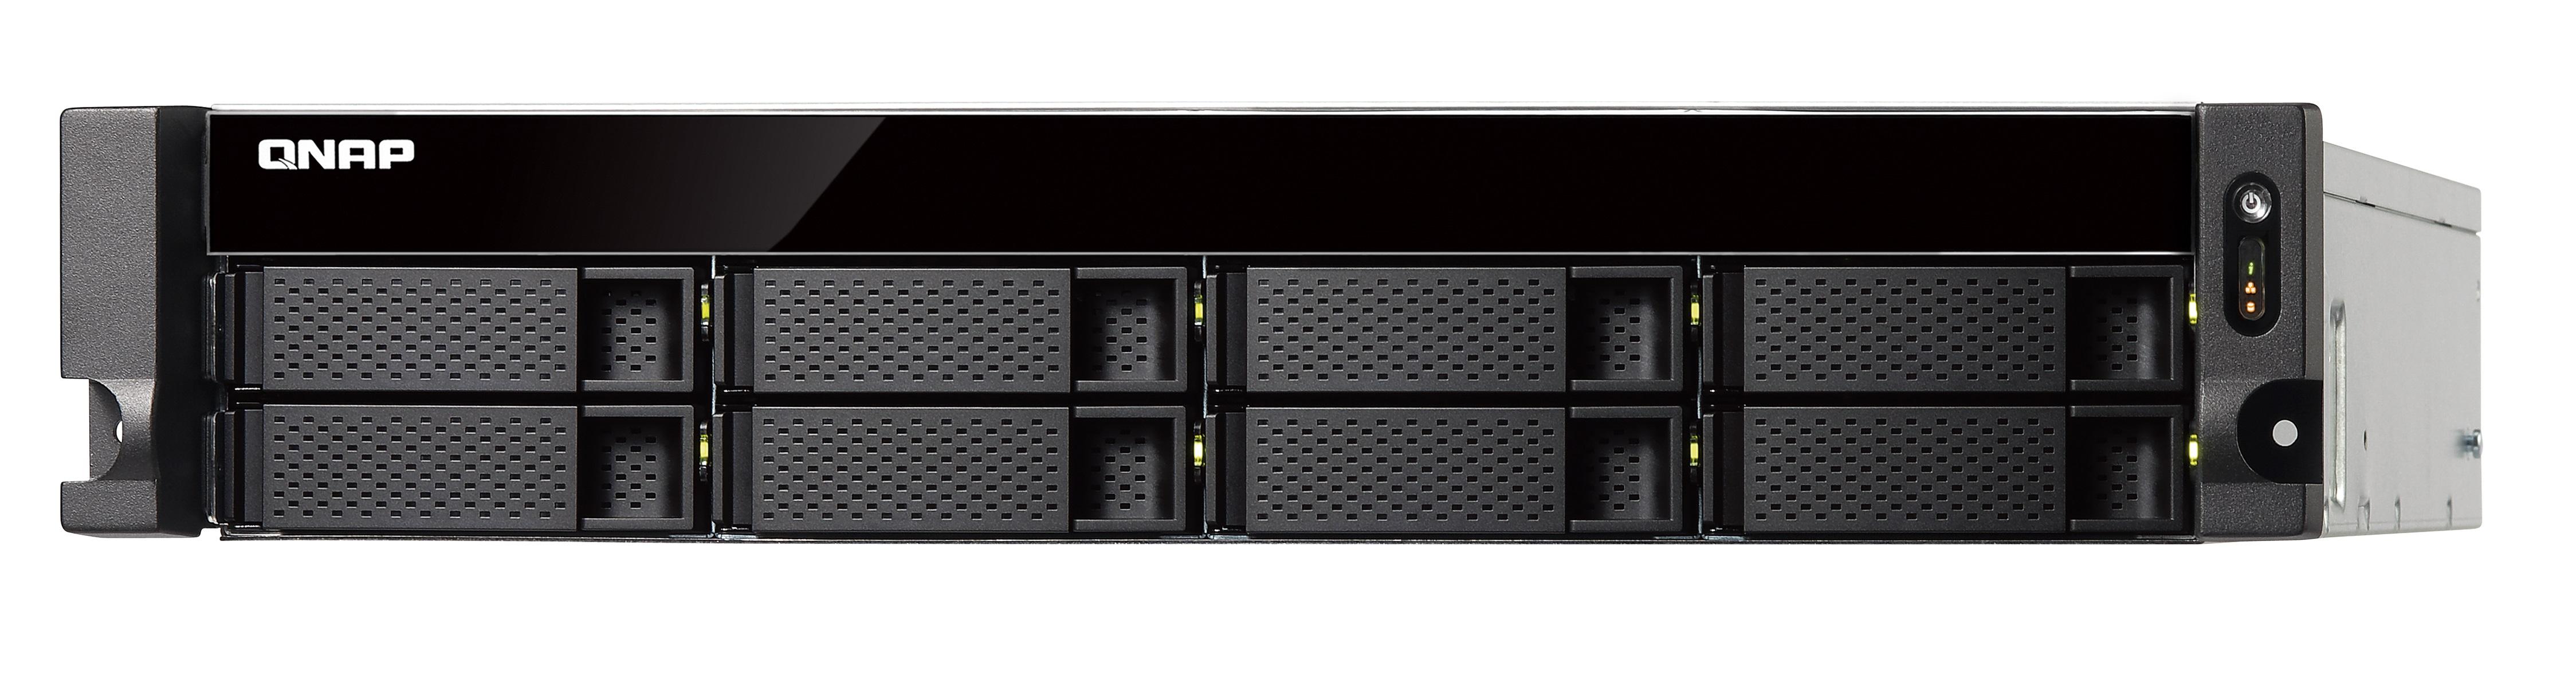 QNAP TS-831XU (1,7GHz/4GB RAM/8xSATA/10GbE SFP+)